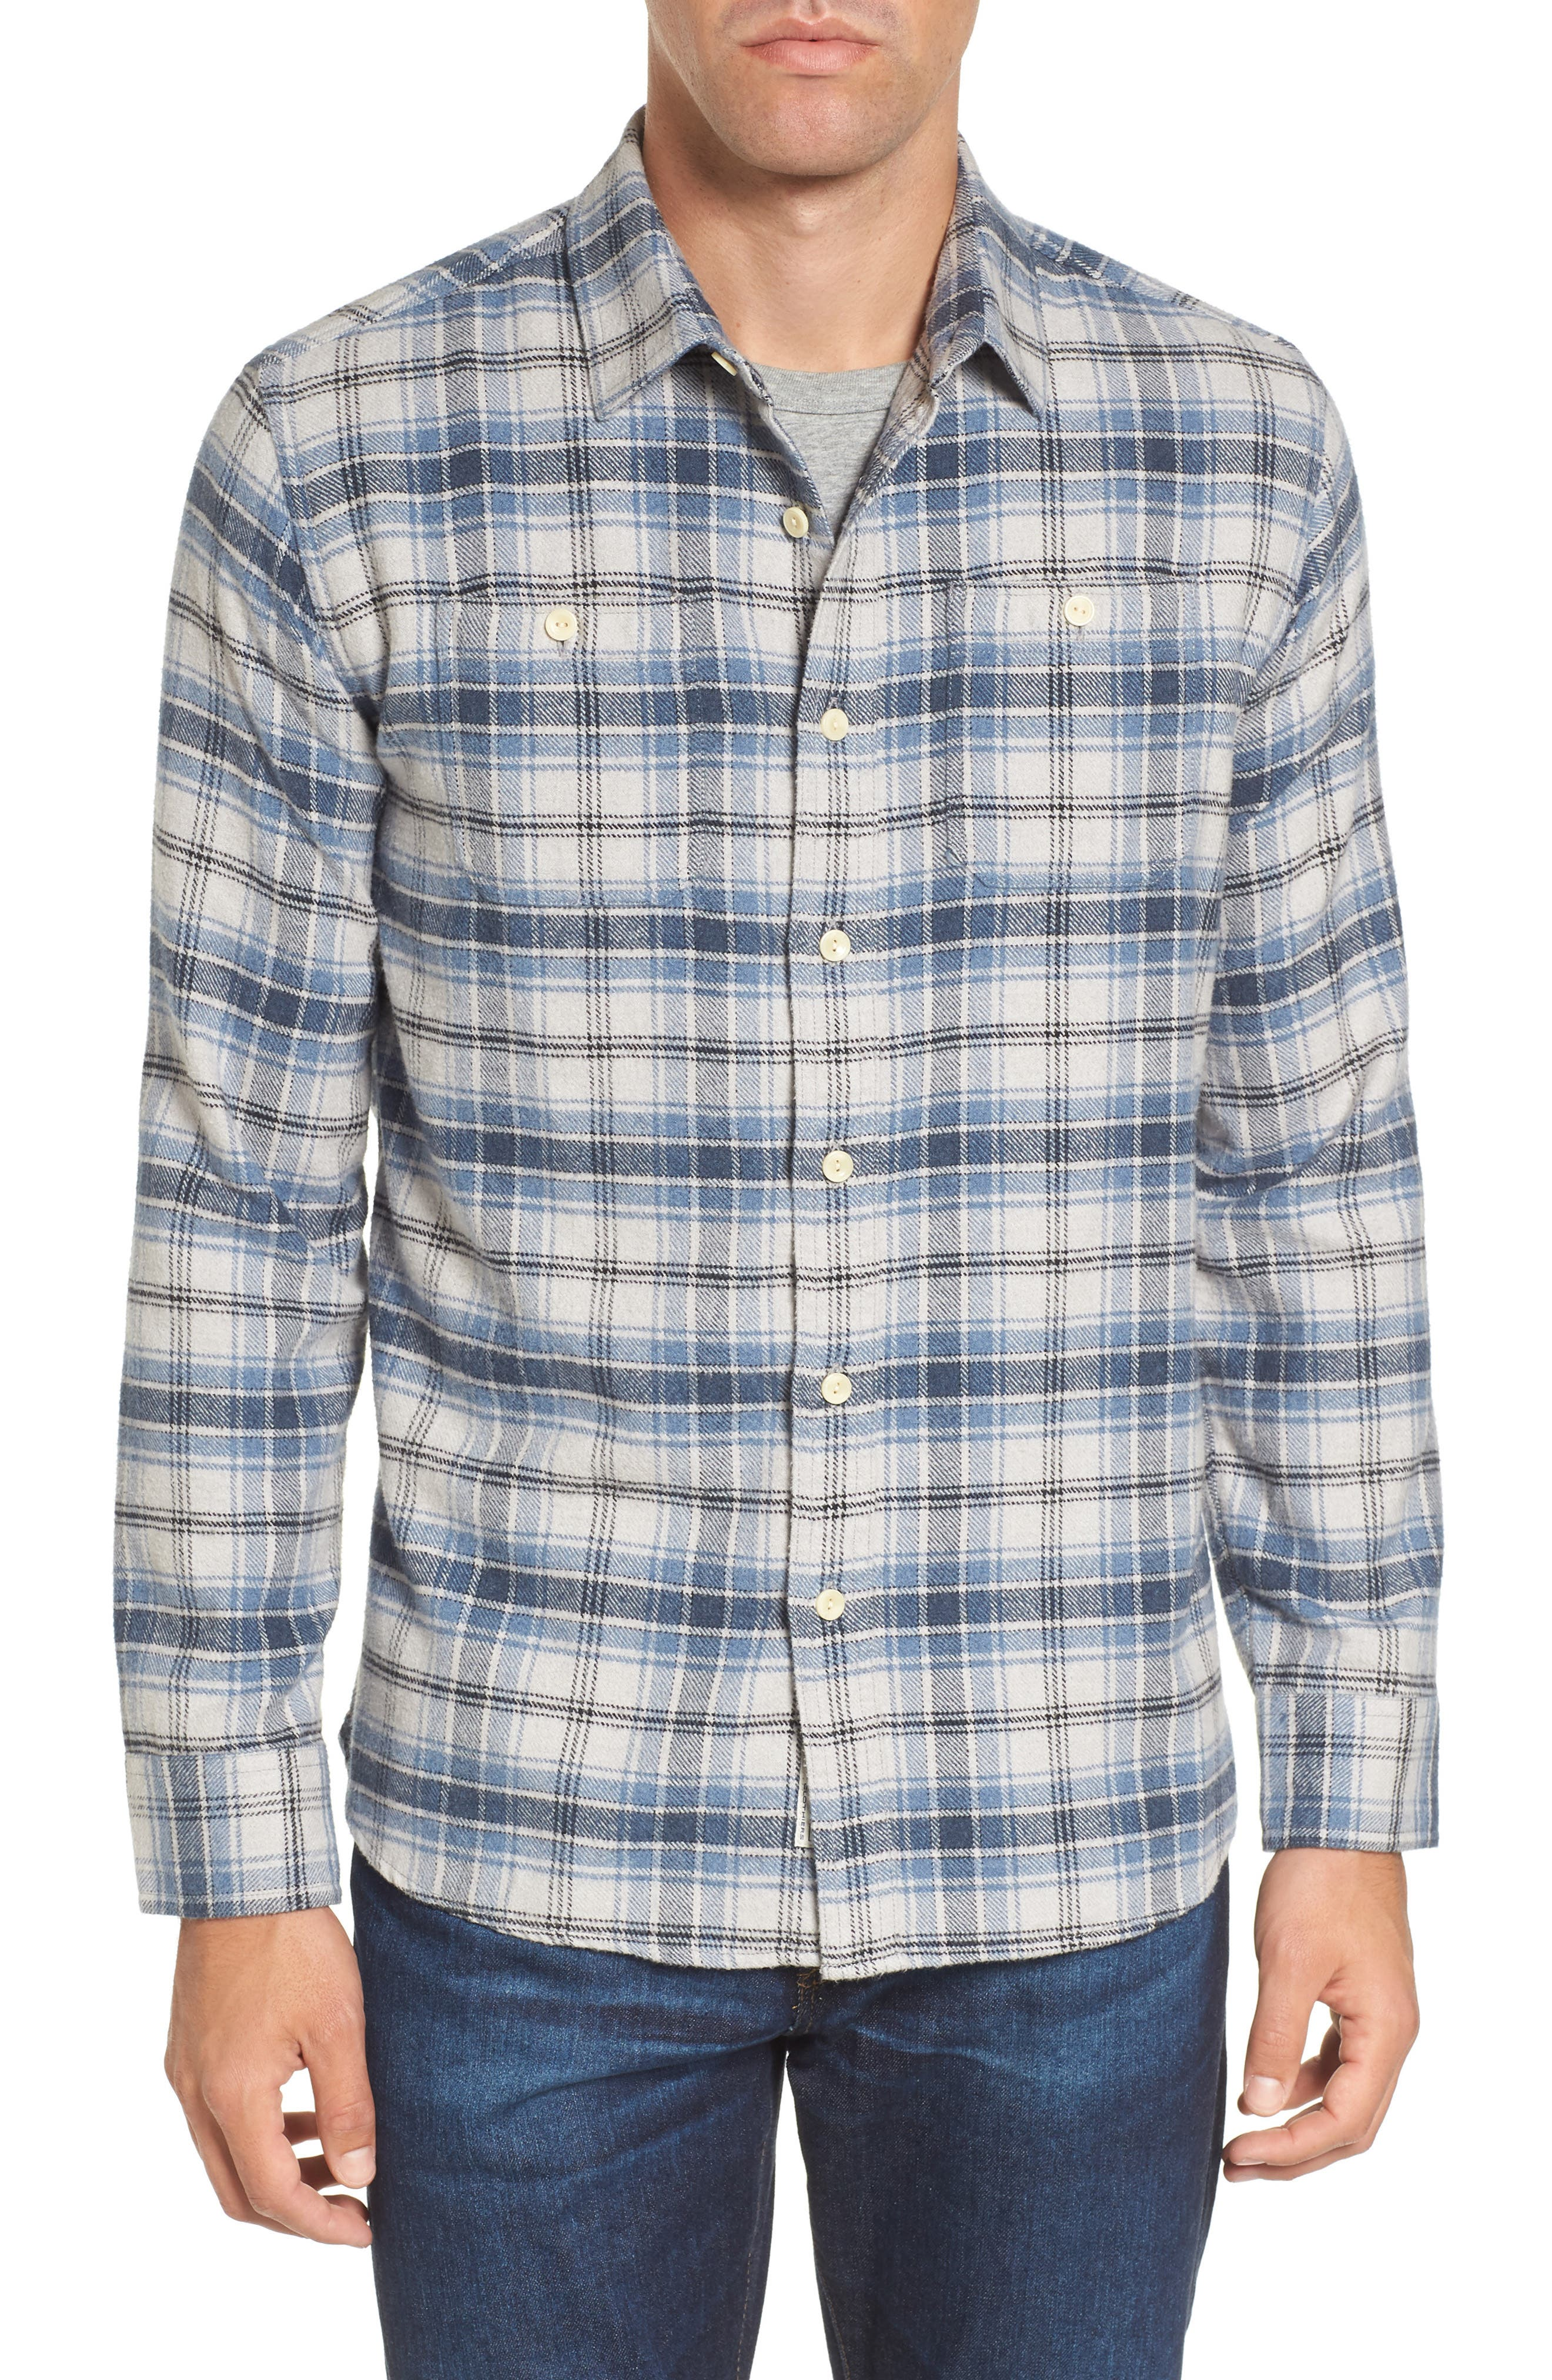 Campton Heritage Plaid Flannel Shirt,                             Main thumbnail 1, color,                             464